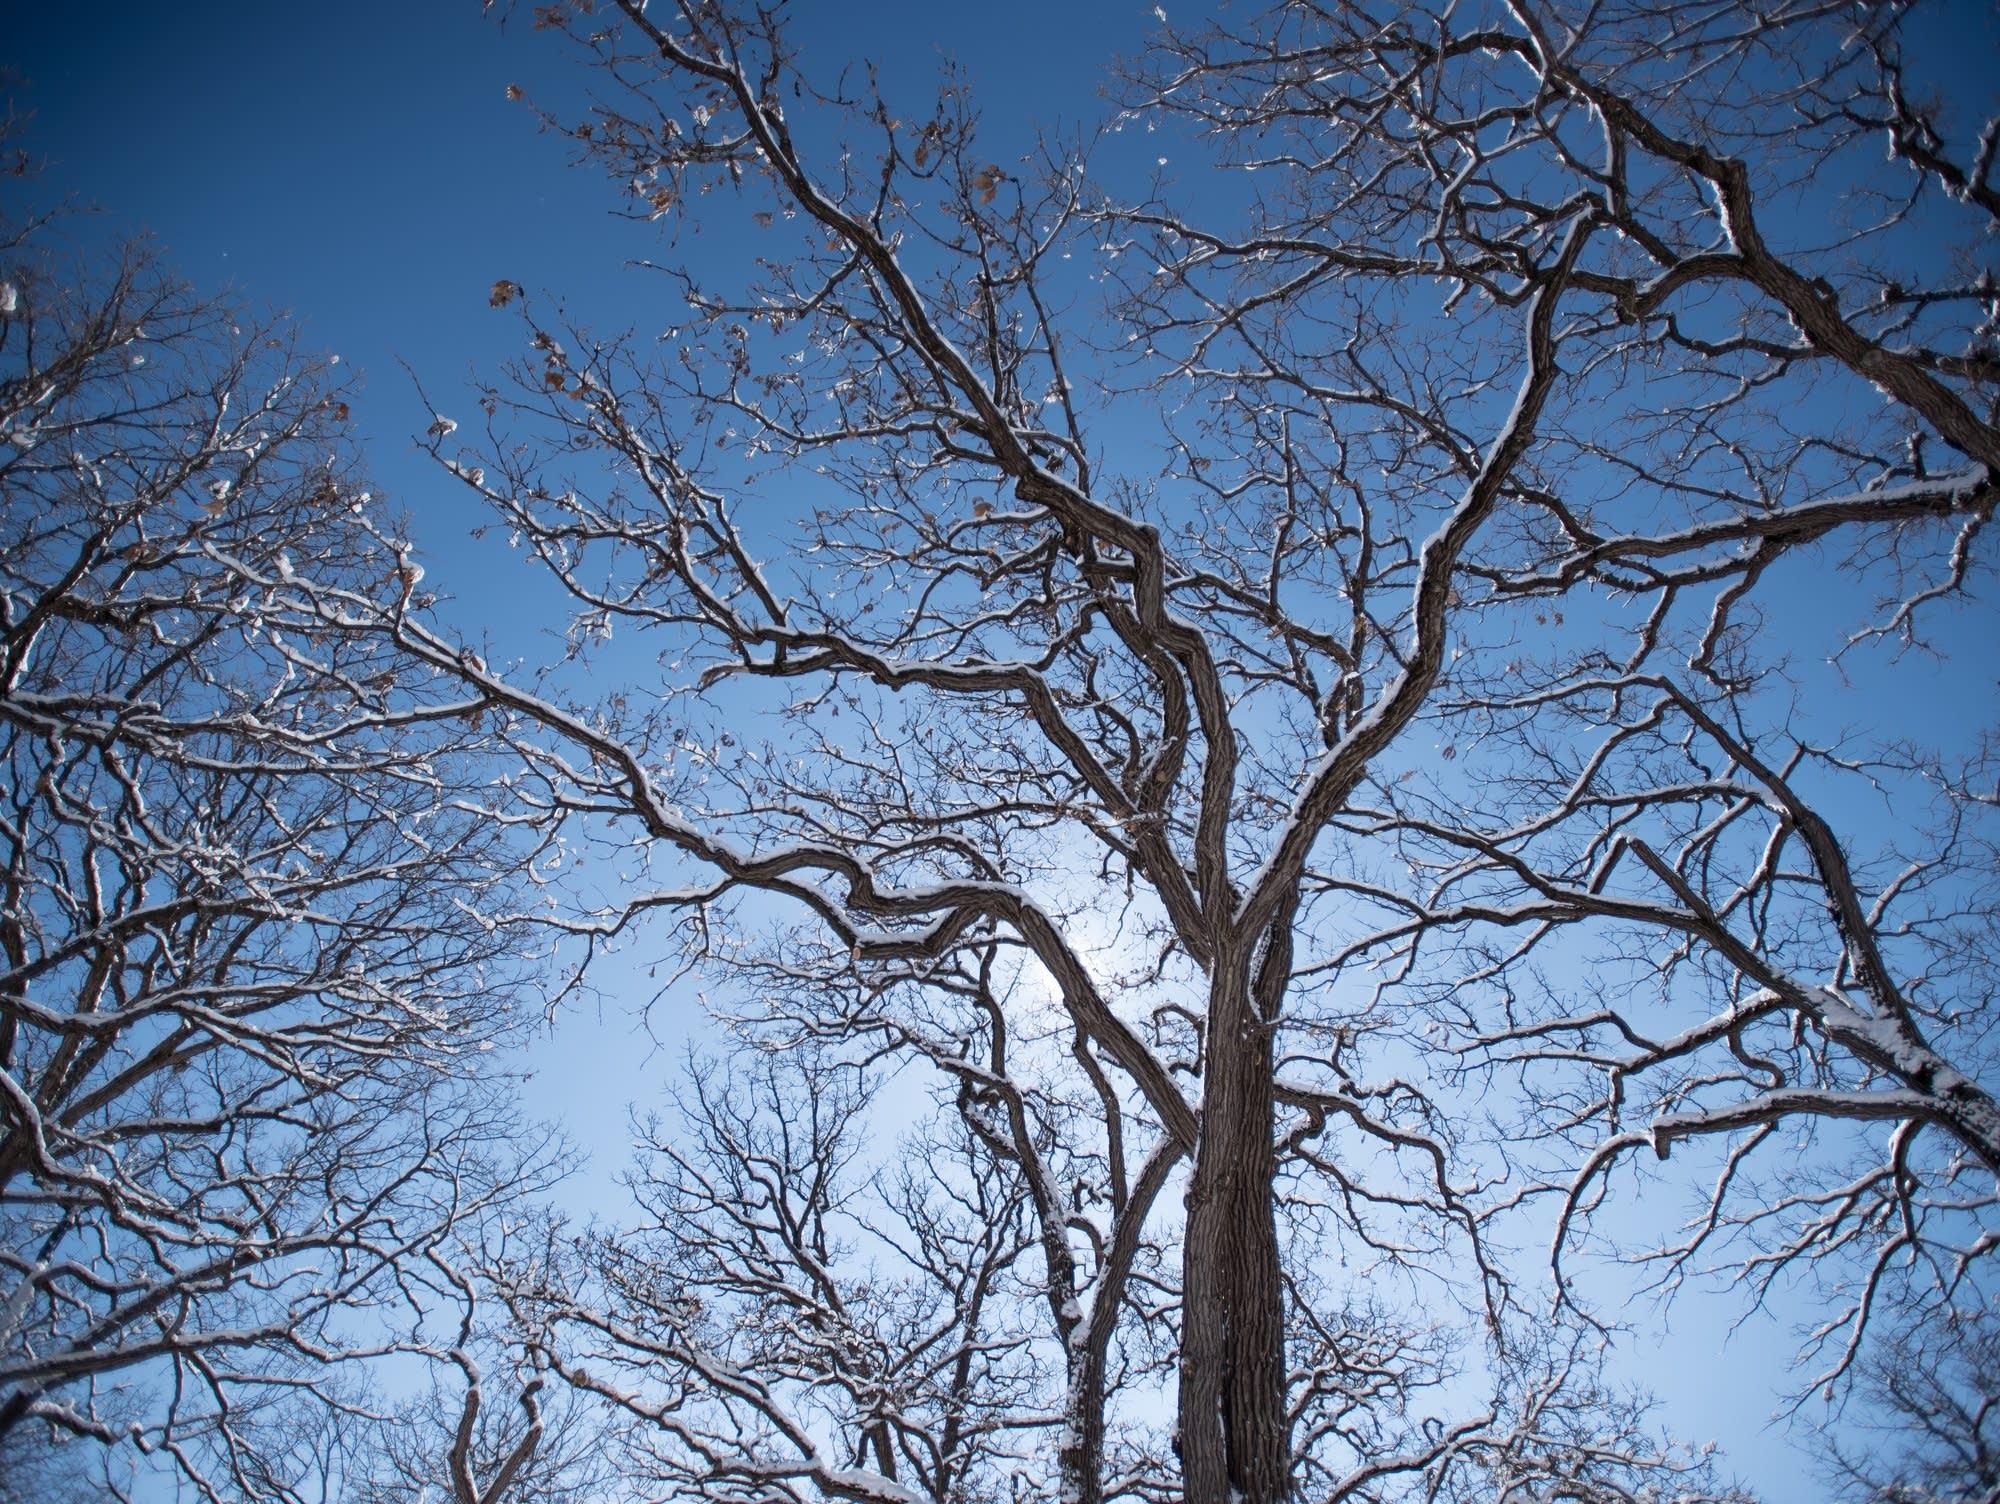 Snow-decked trees at Minnehaha Falls in Minneapolis